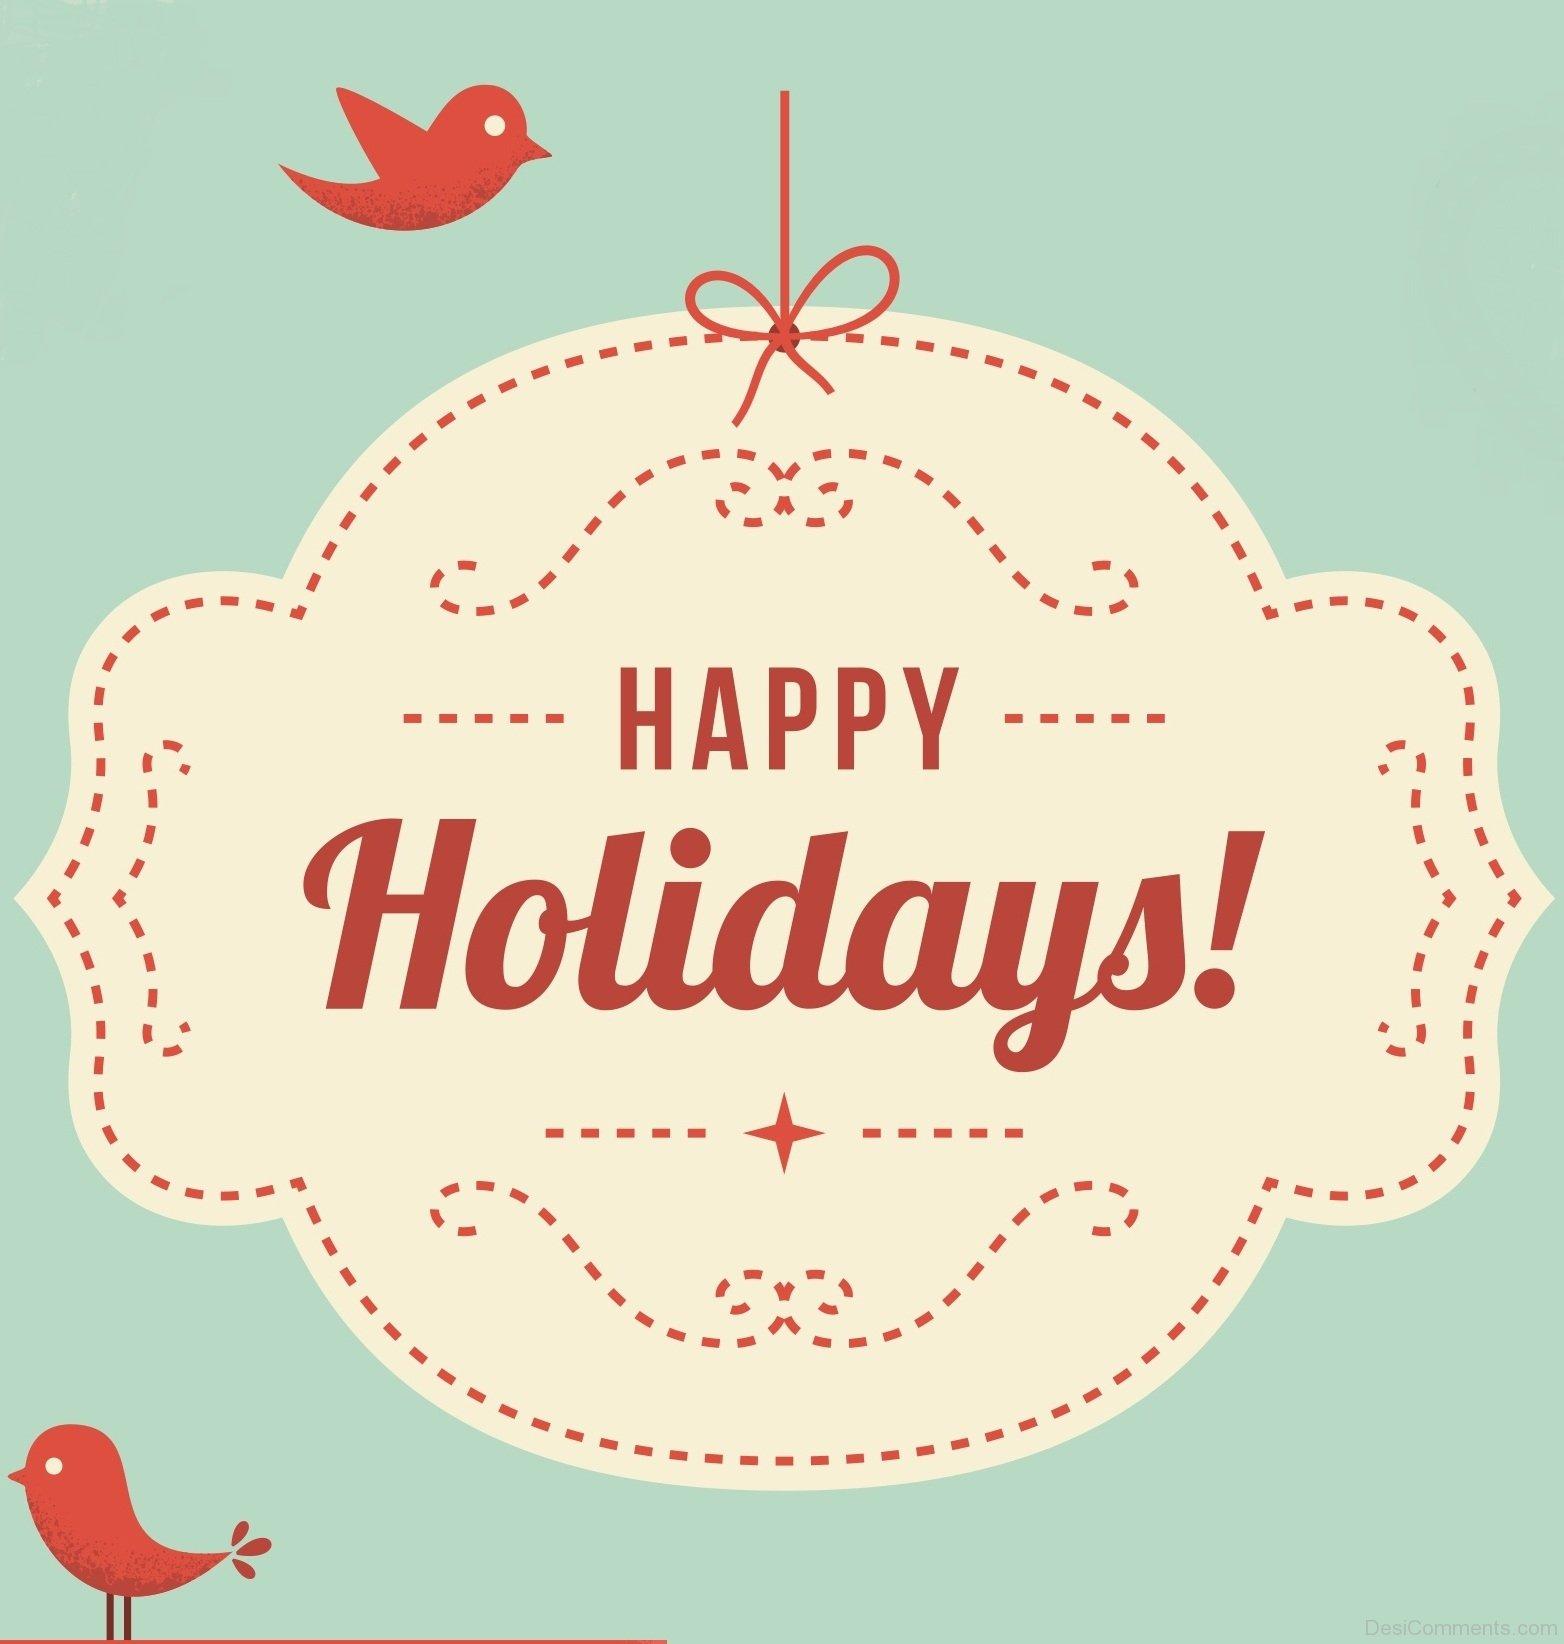 Happy-Holidays-Photo-1.jpg